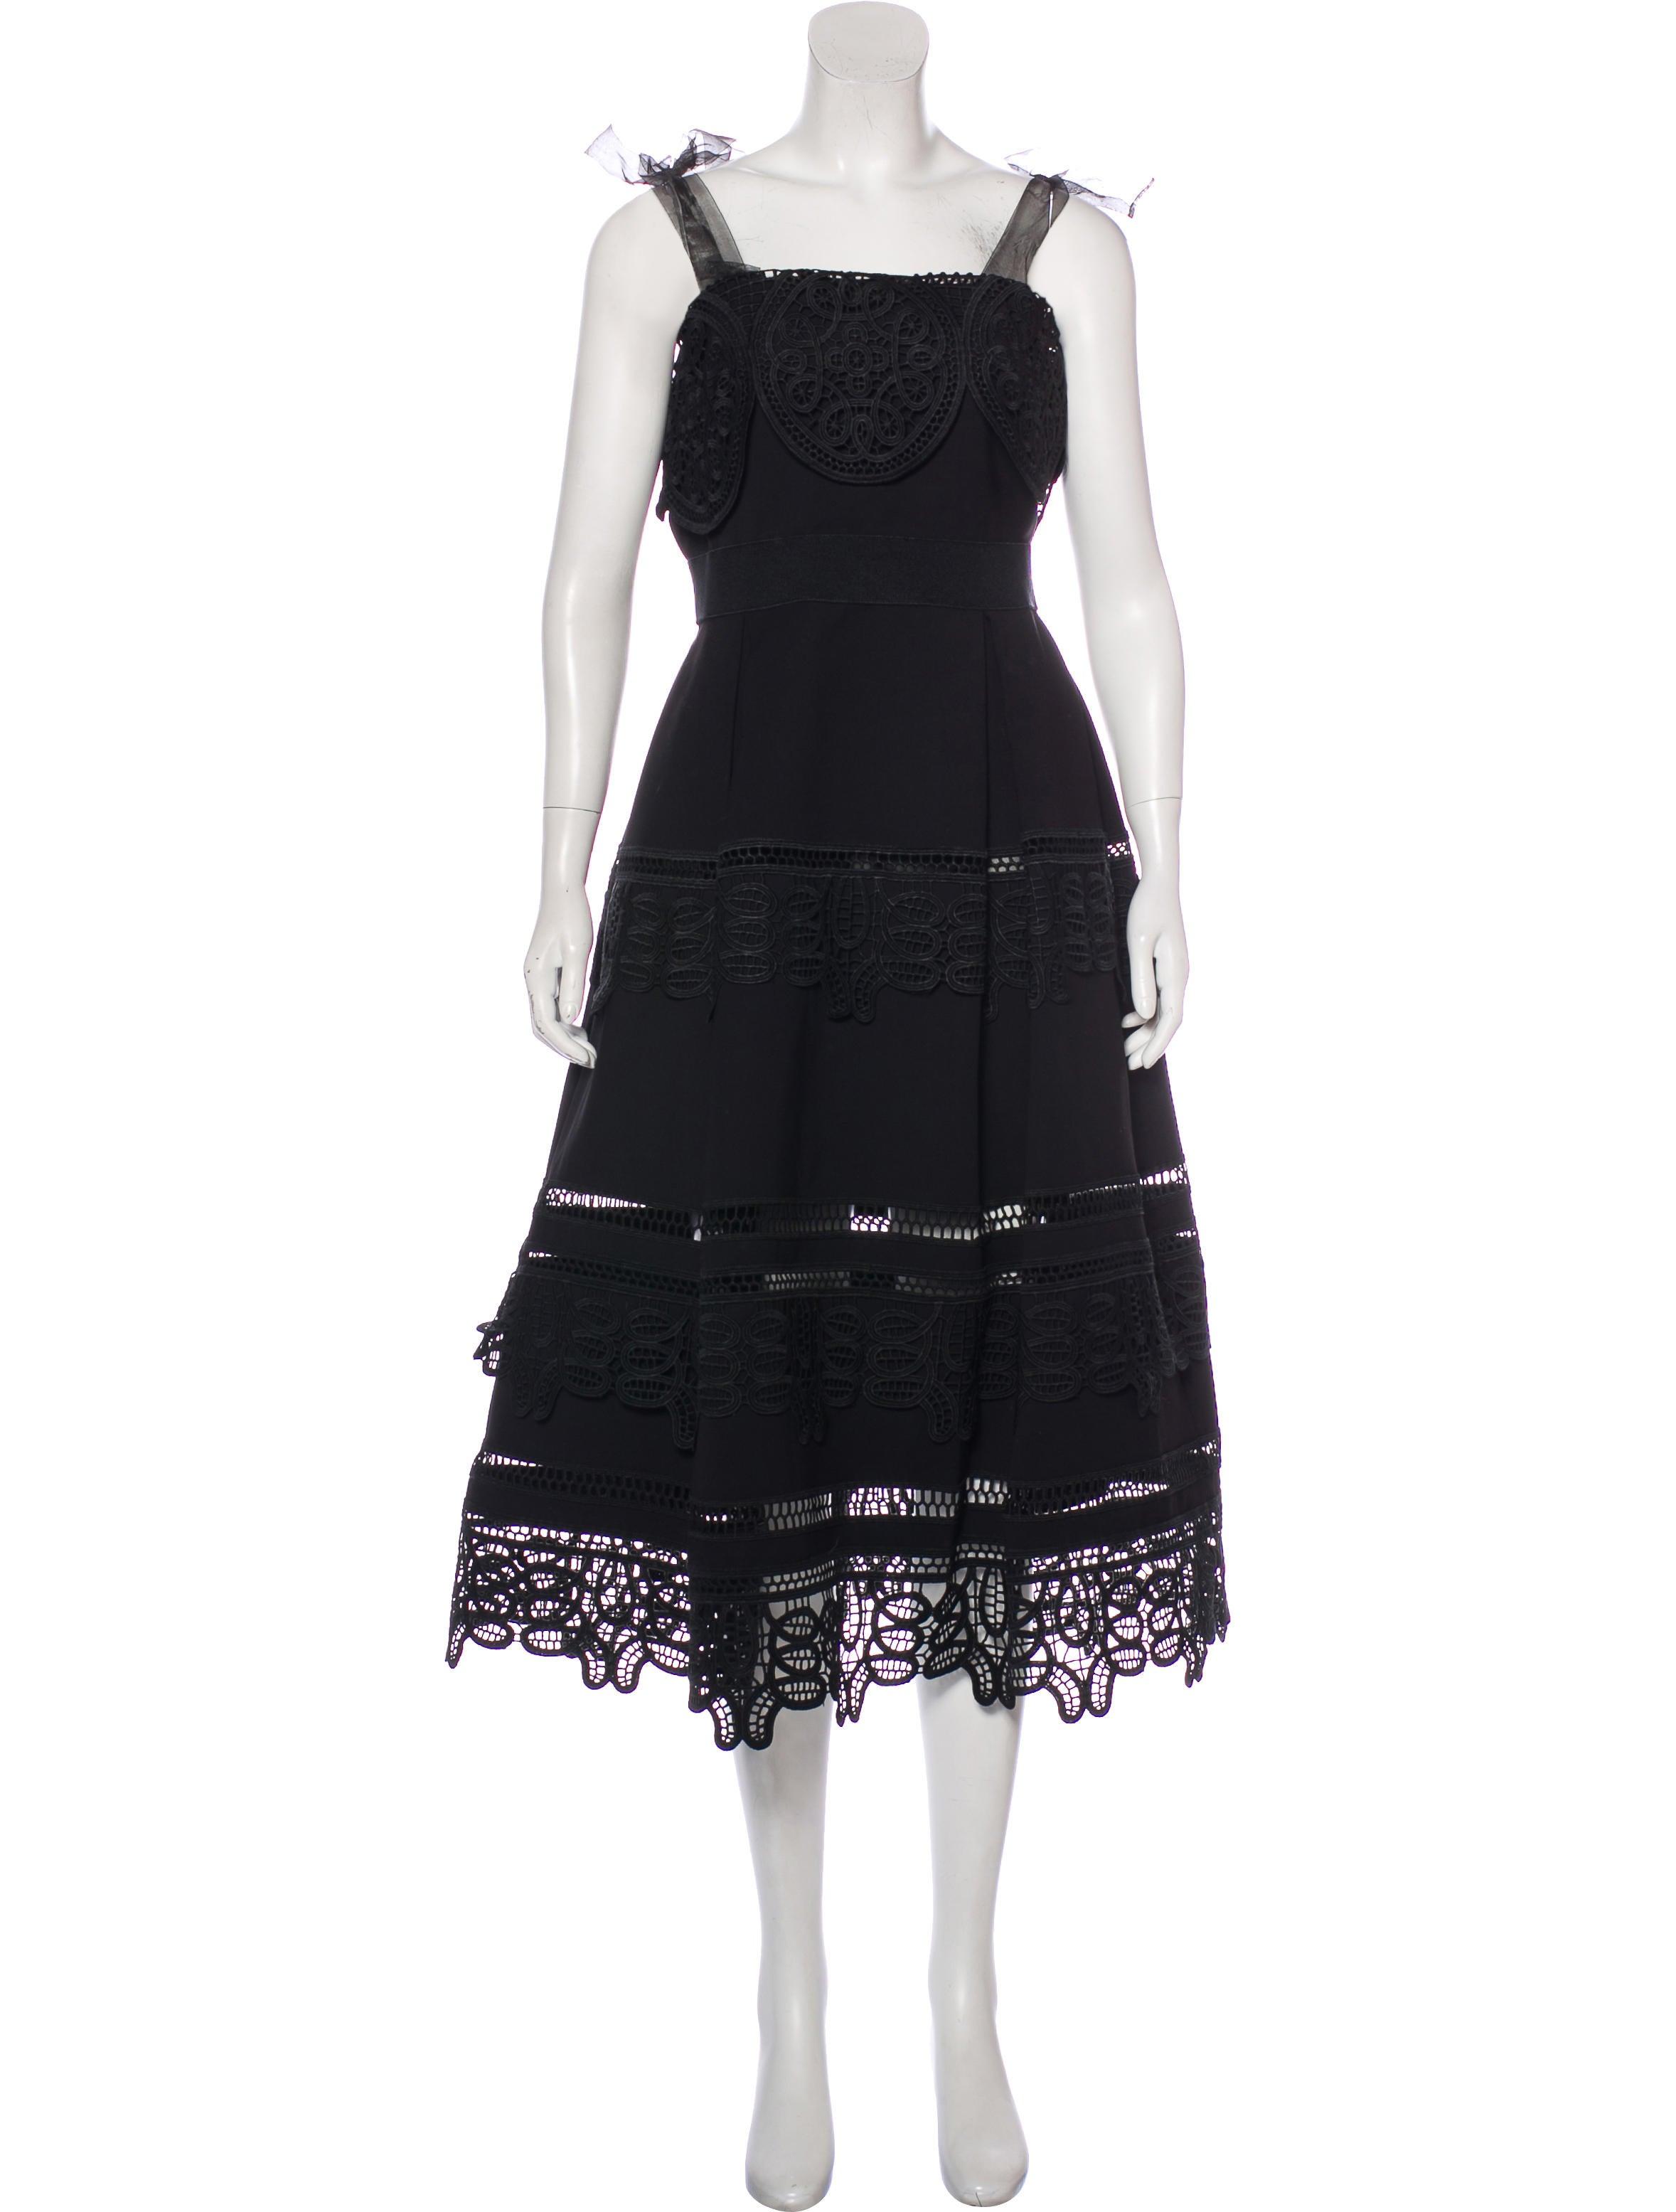 2c494e15cbb Self-Portrait Nightshade Midi Dress - Clothing - WSELF22717